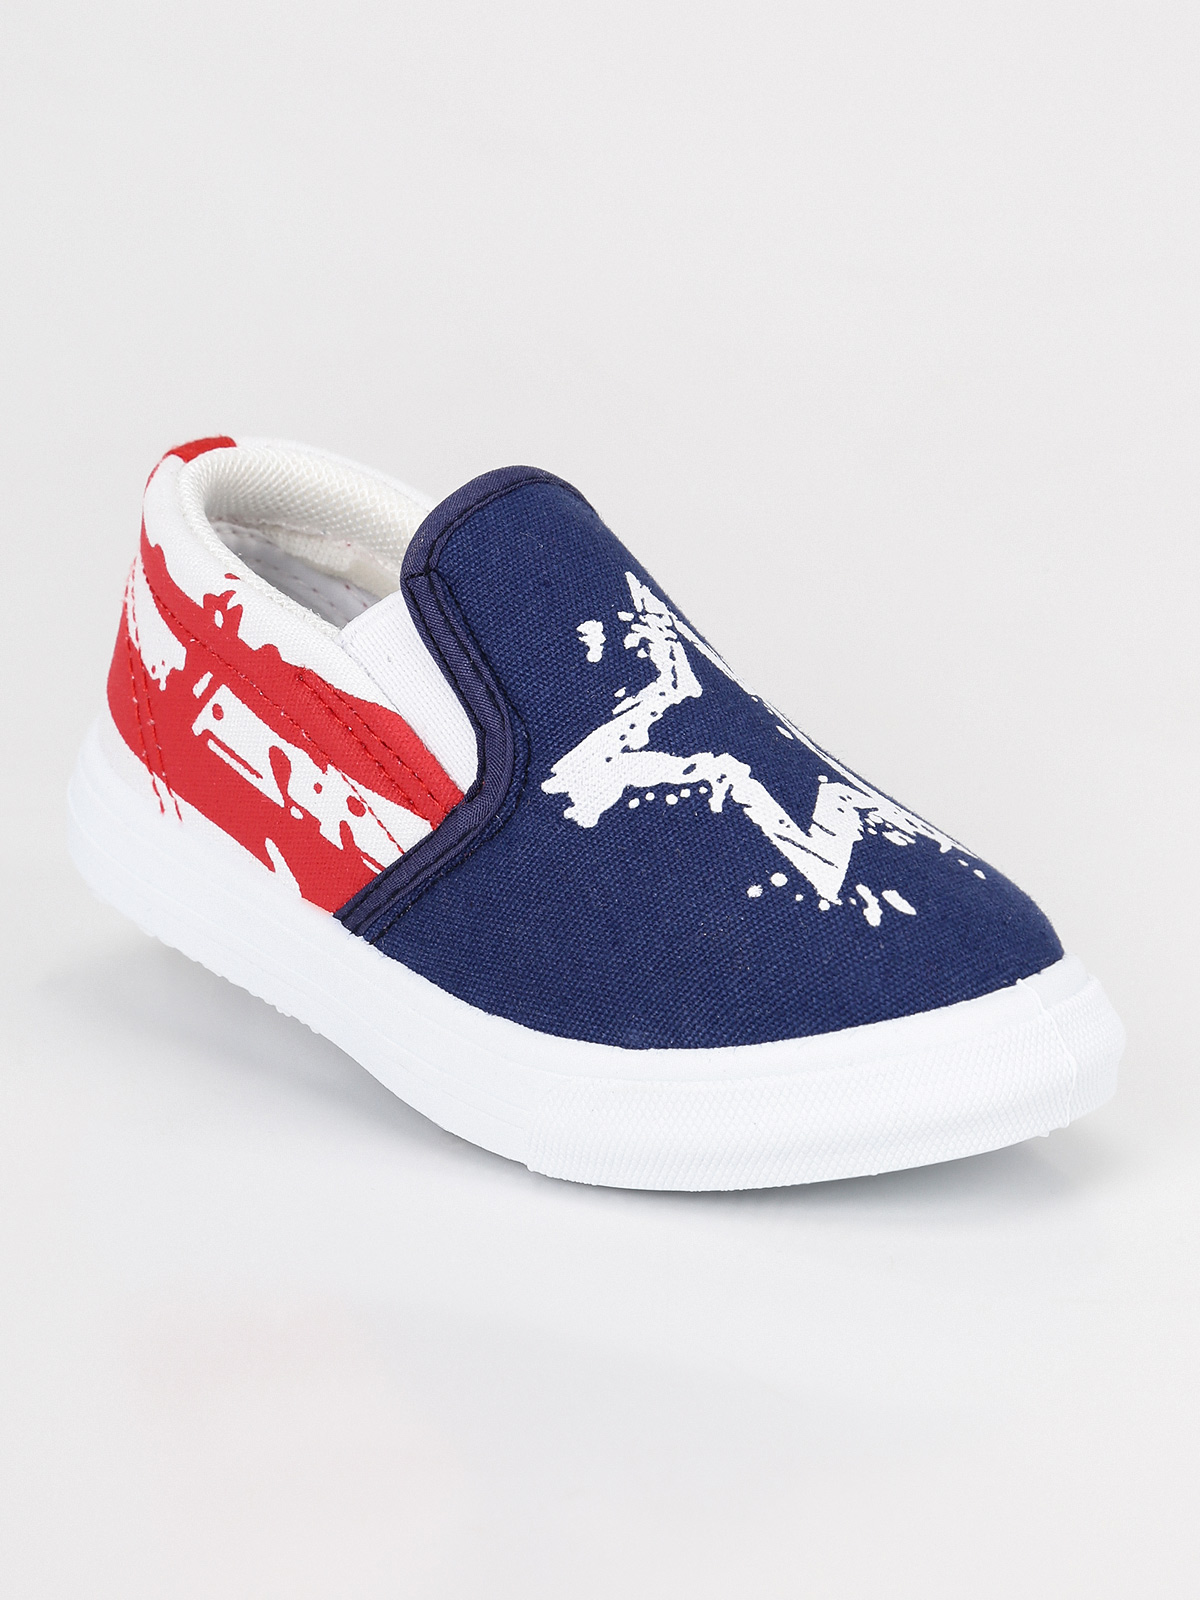 Sneakers üzerinde kayma bebek erkek title=